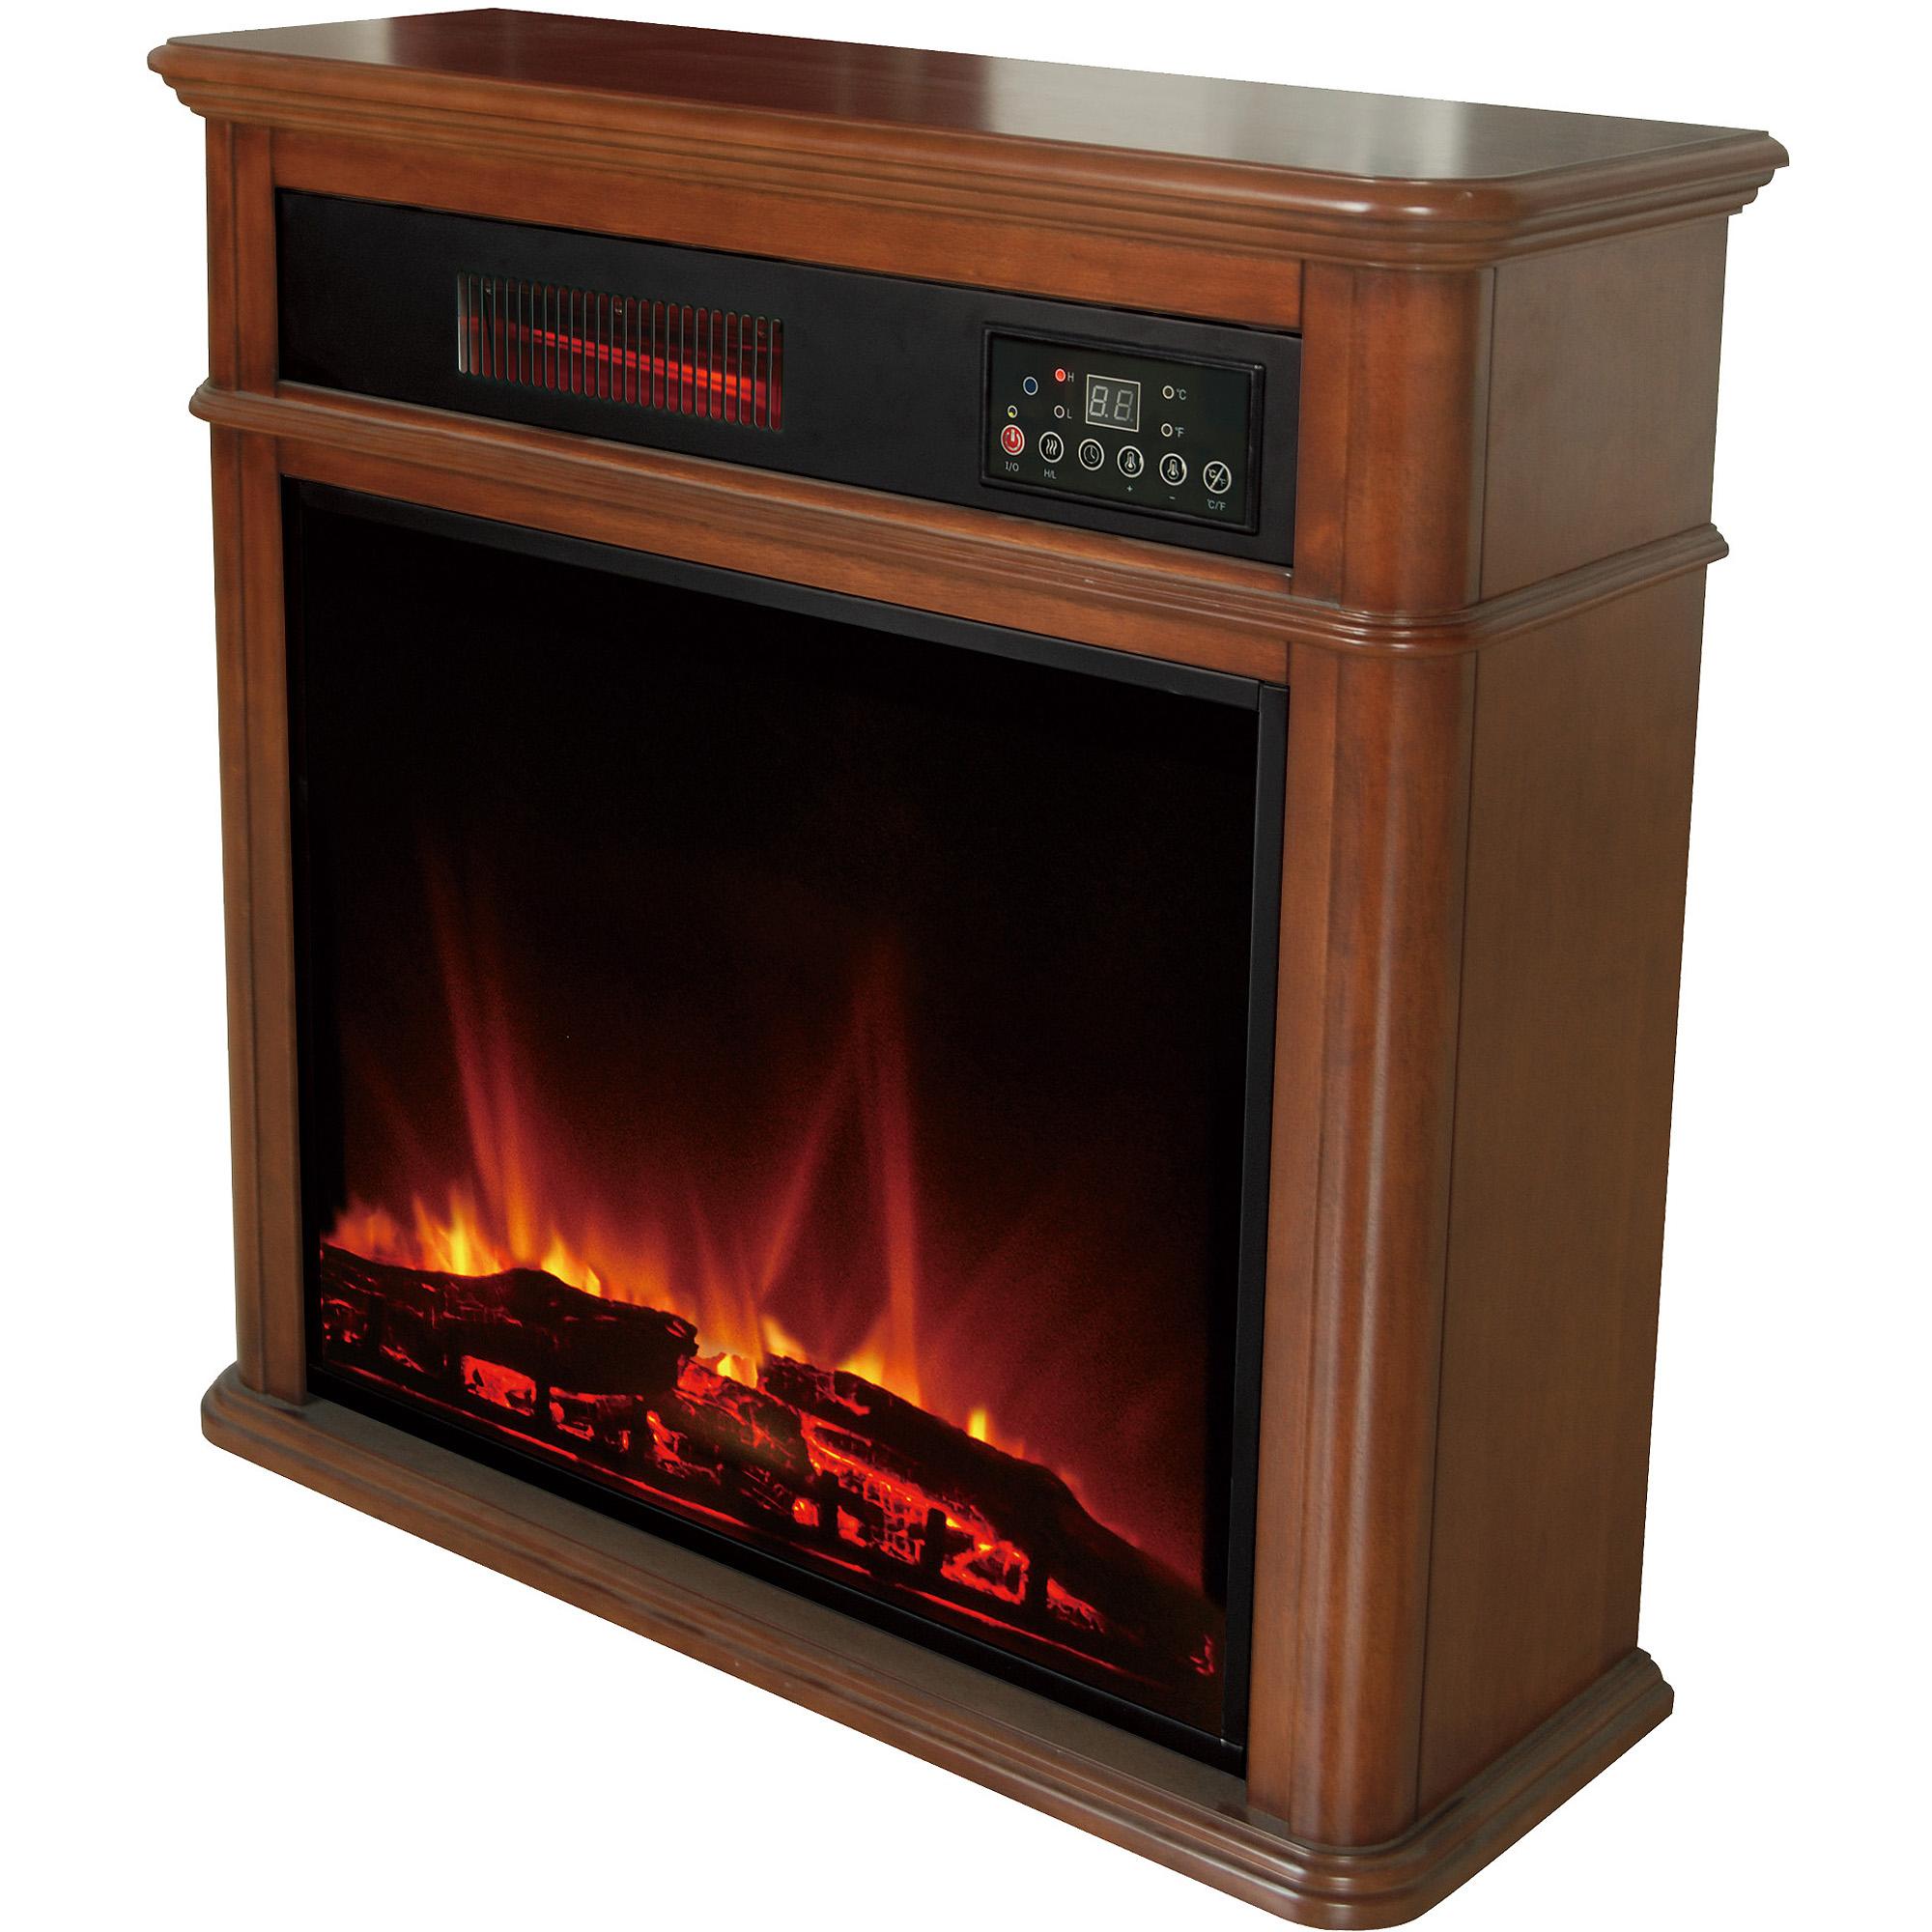 Hearth Trends Dayton Infrared Fireplace - Walmart.com